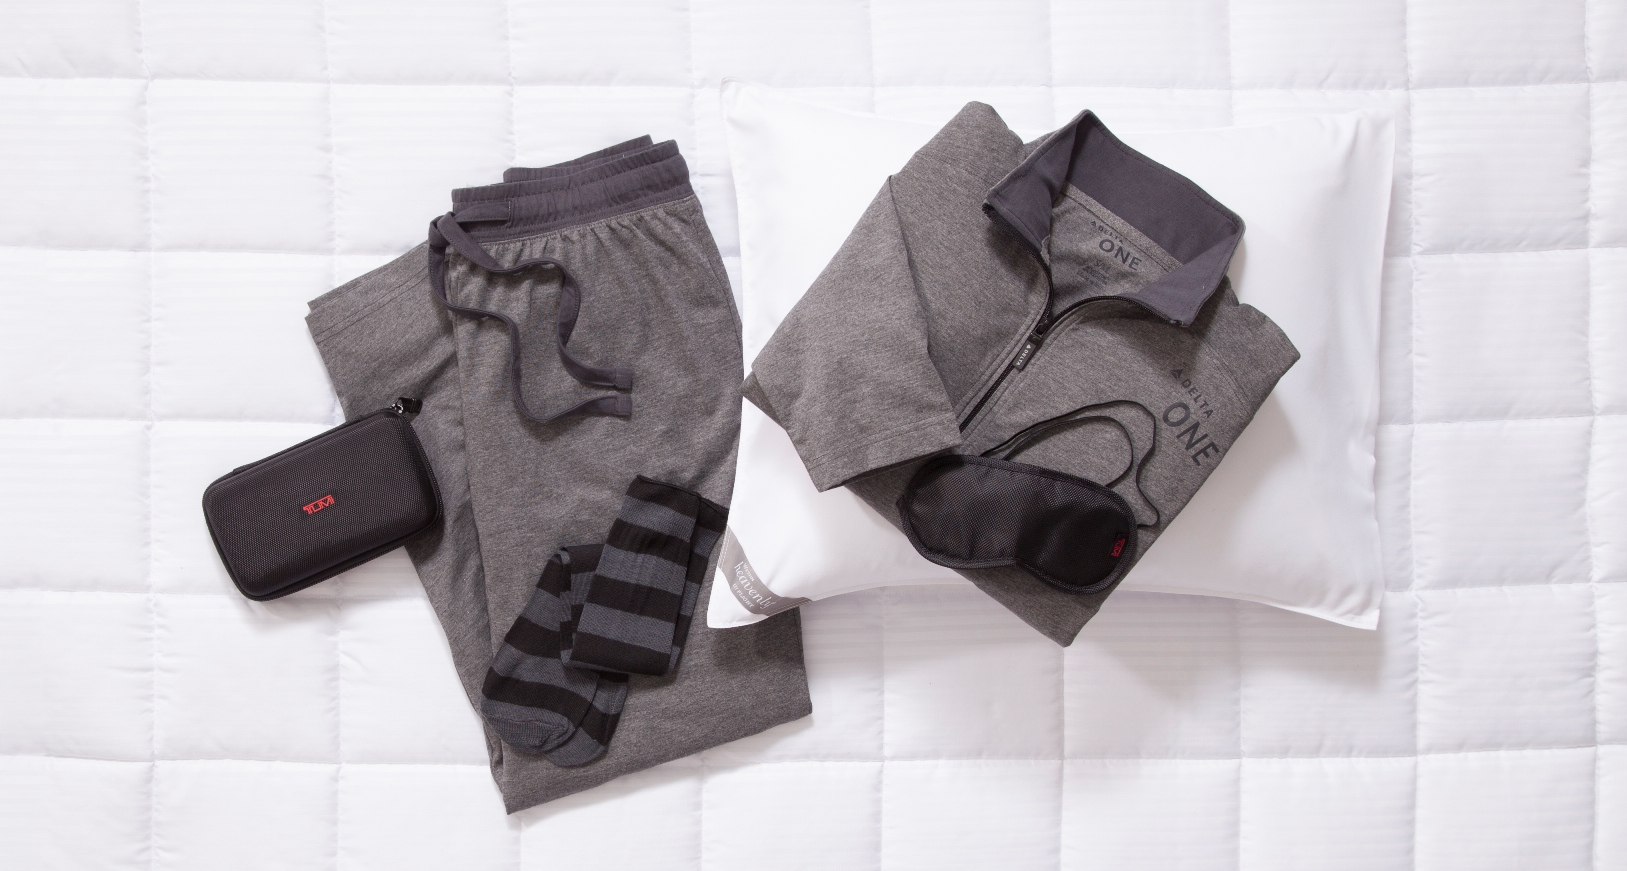 Delta One Sleep Suit